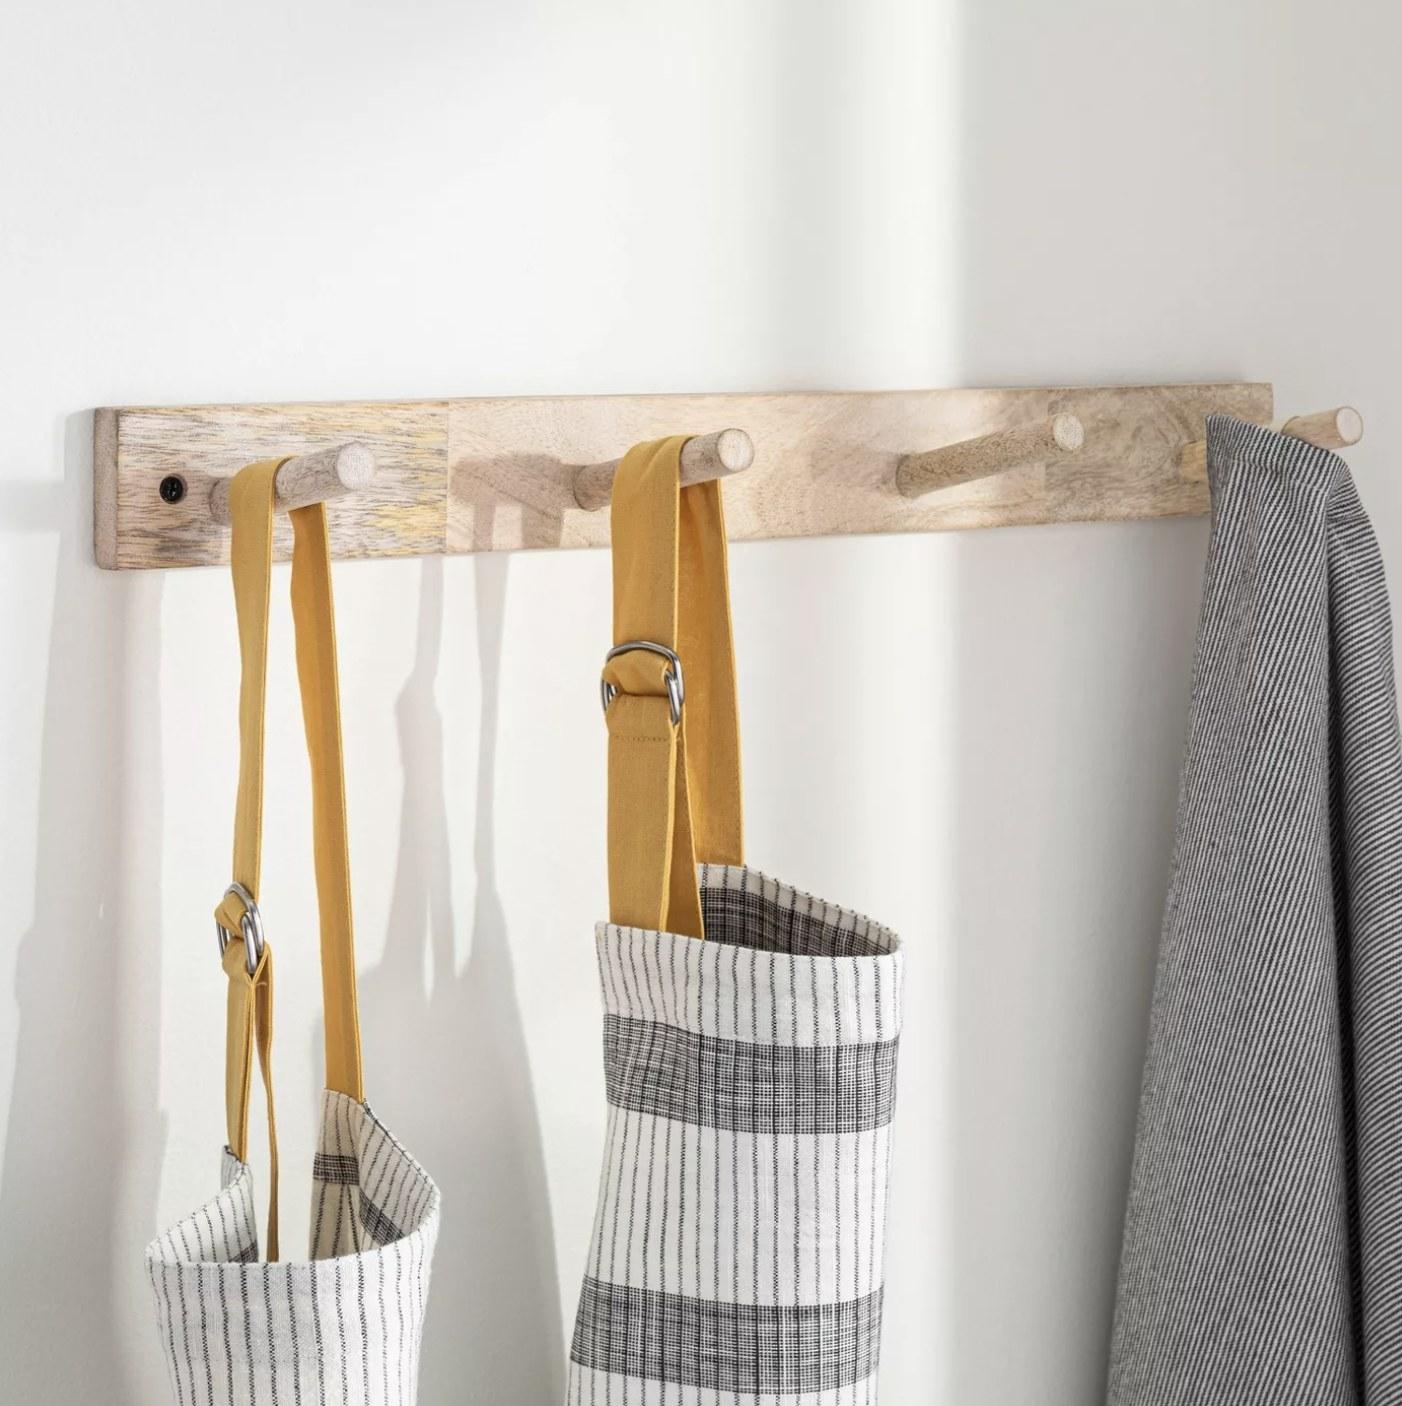 A four-peg wall hook